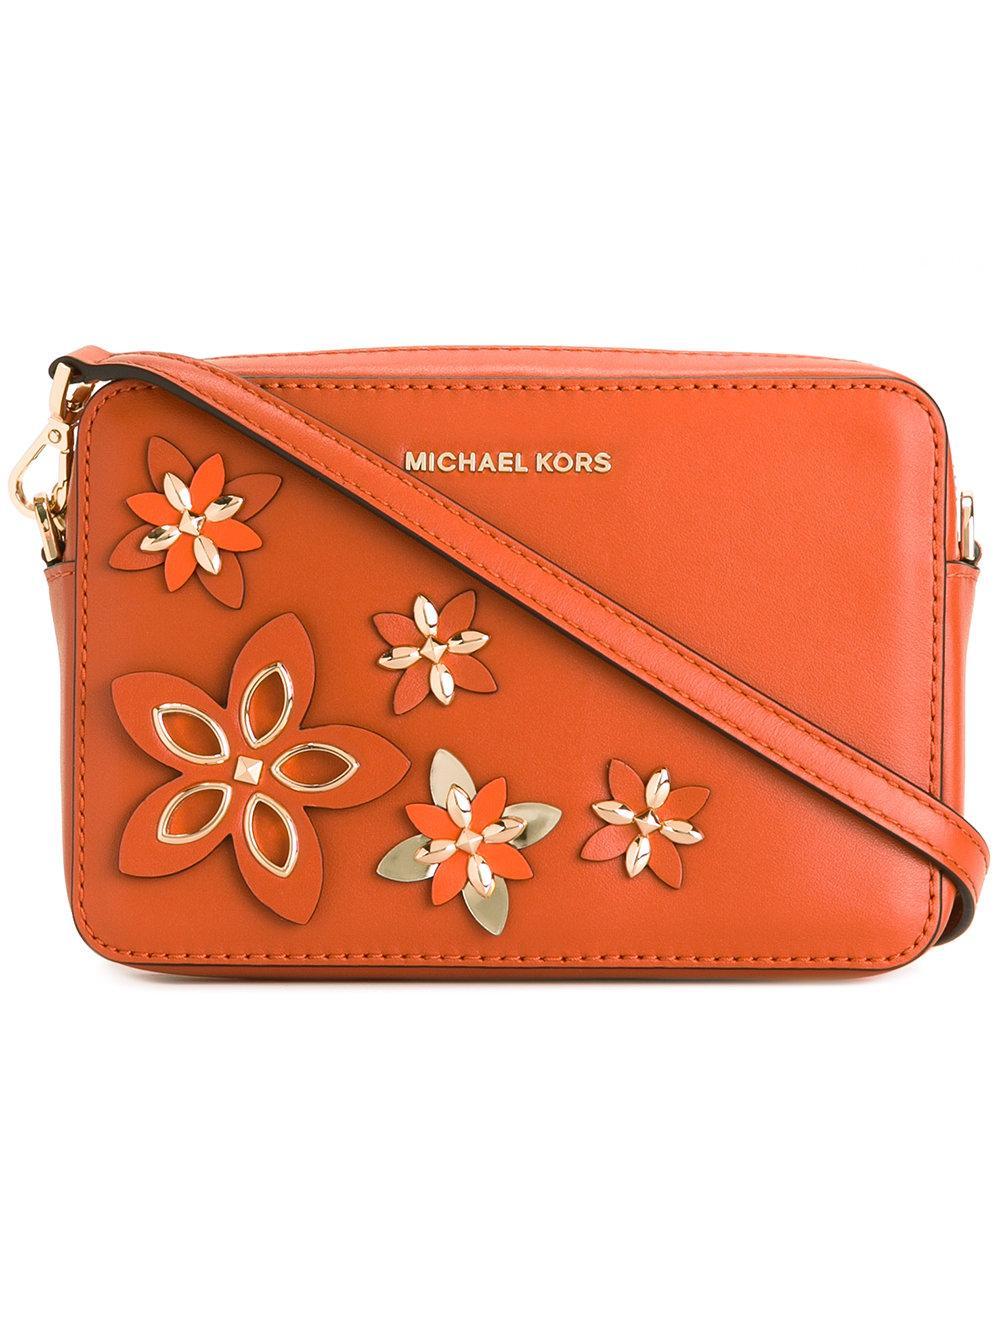 Michael Michael Kors Floral Crossbody Bag In Orange | Lyst